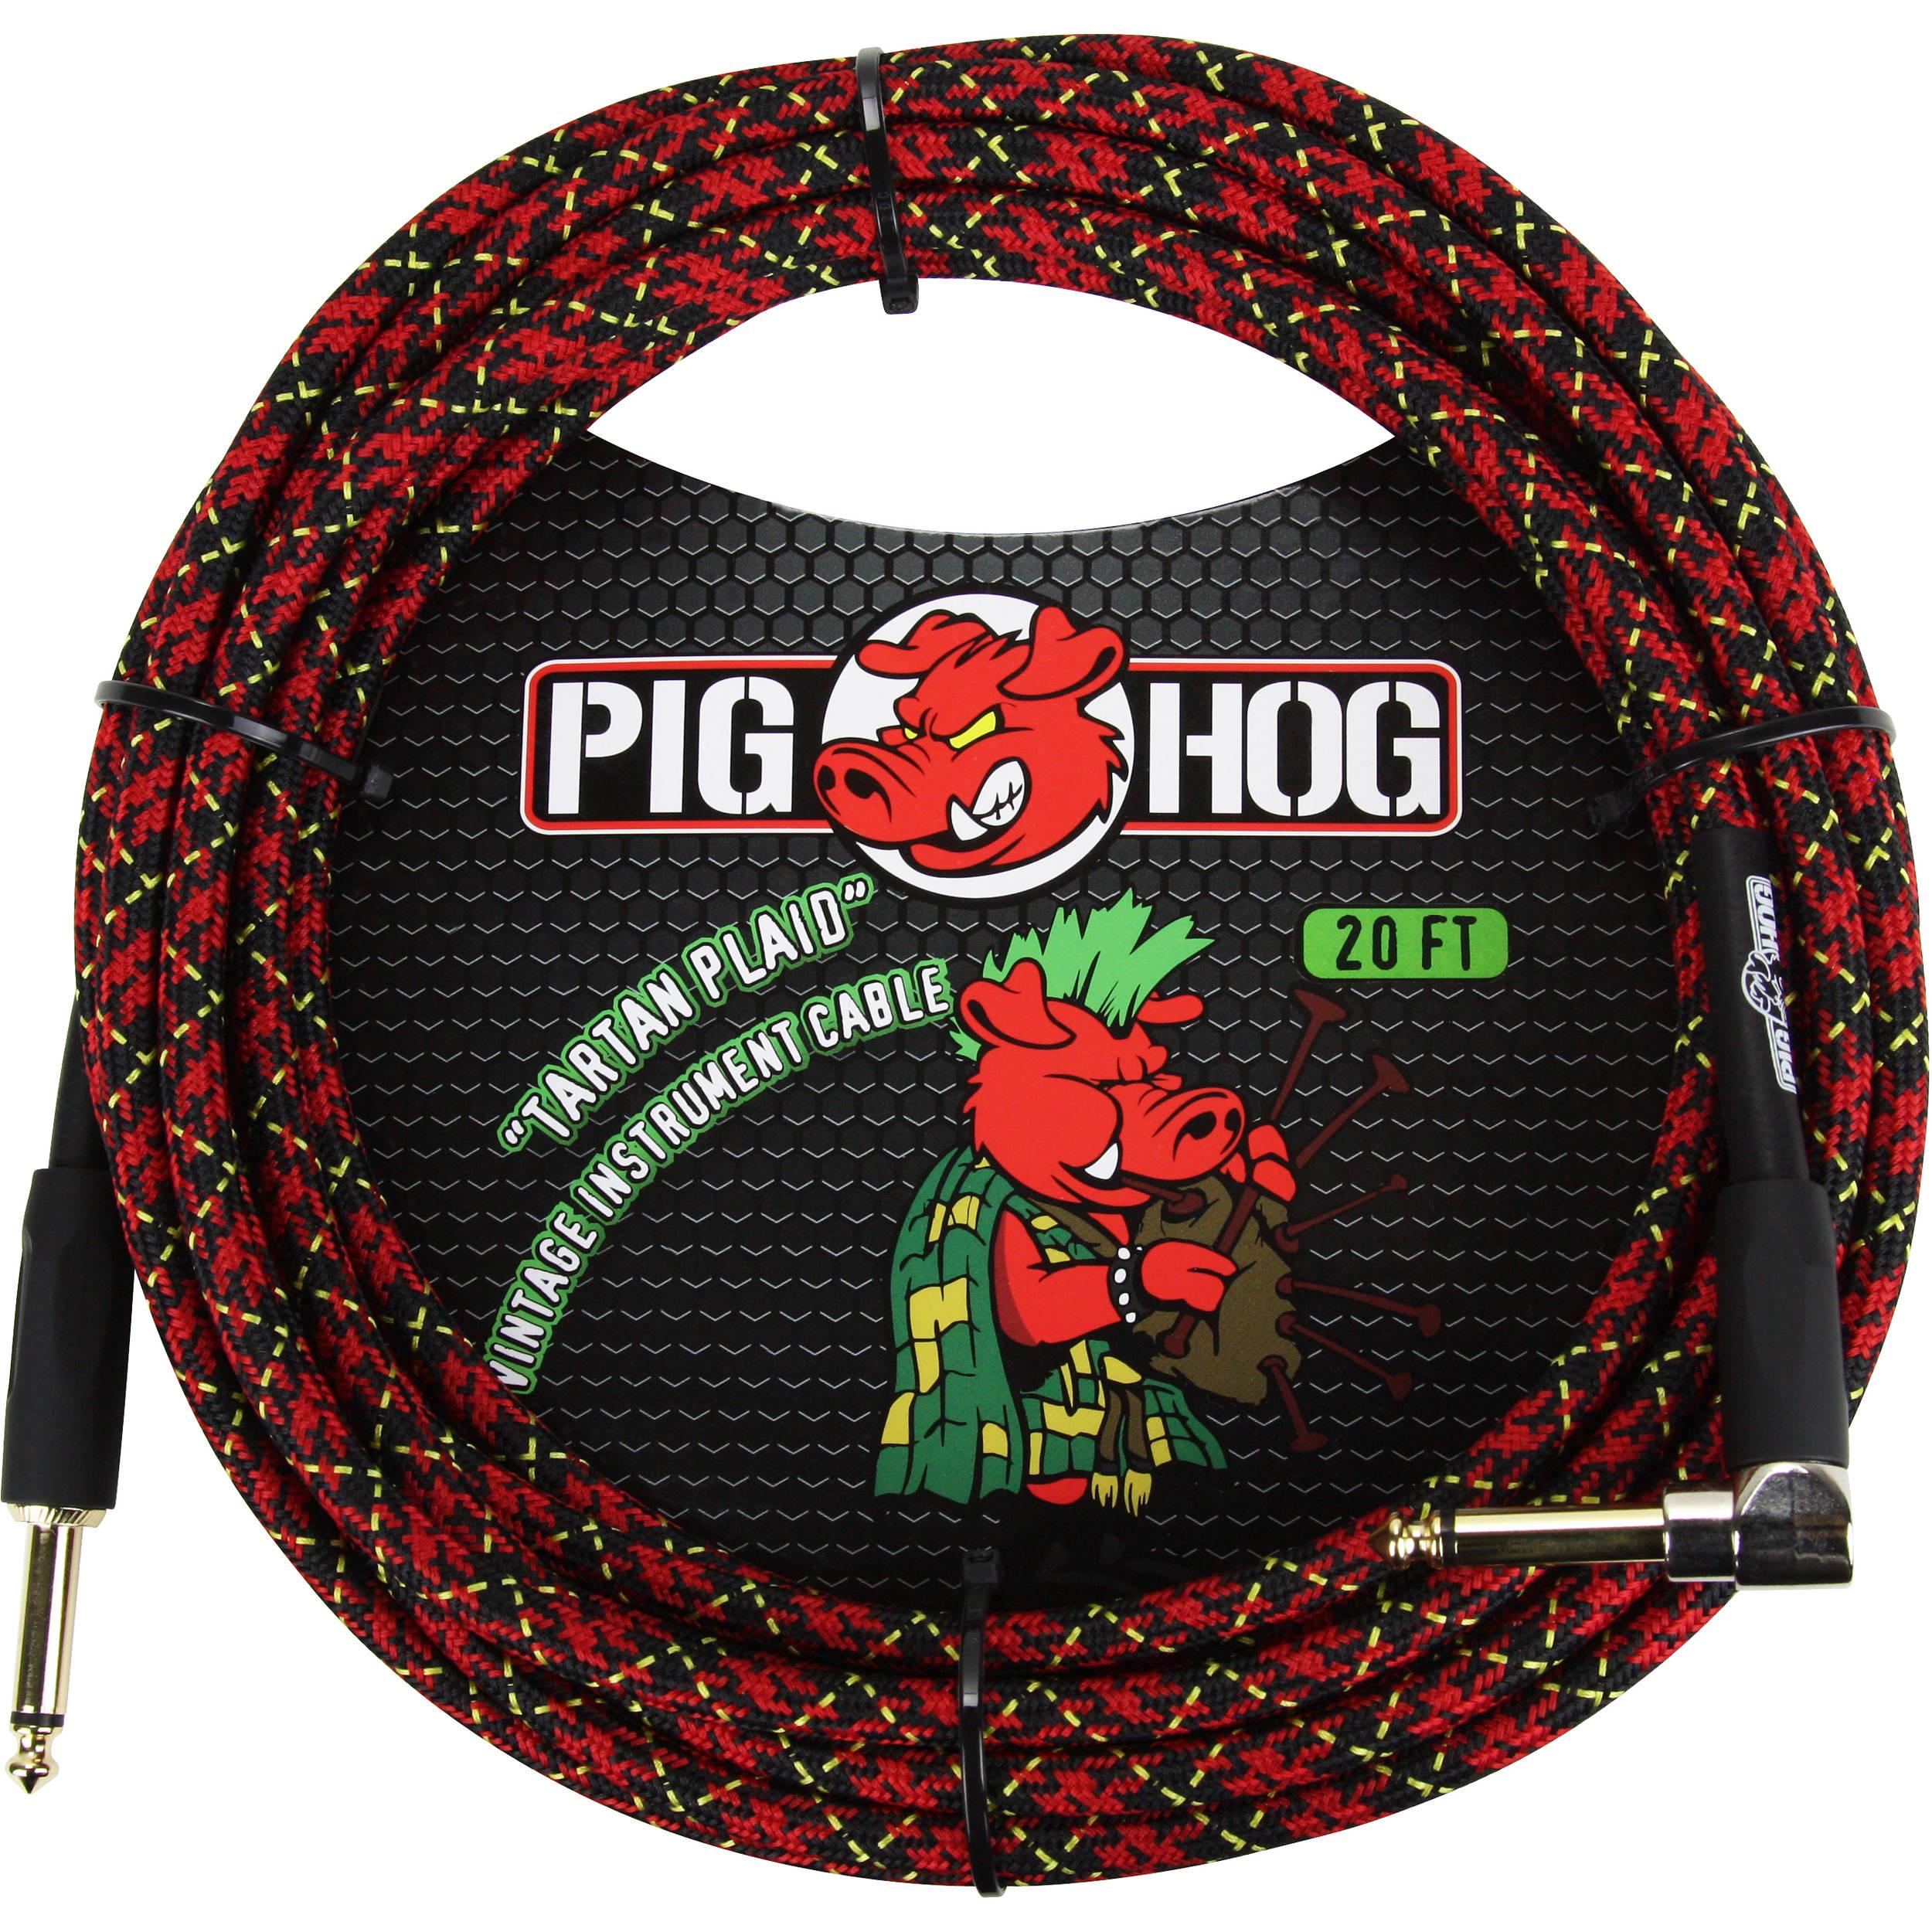 PIG HOG 20 FT TARTAN PLAID